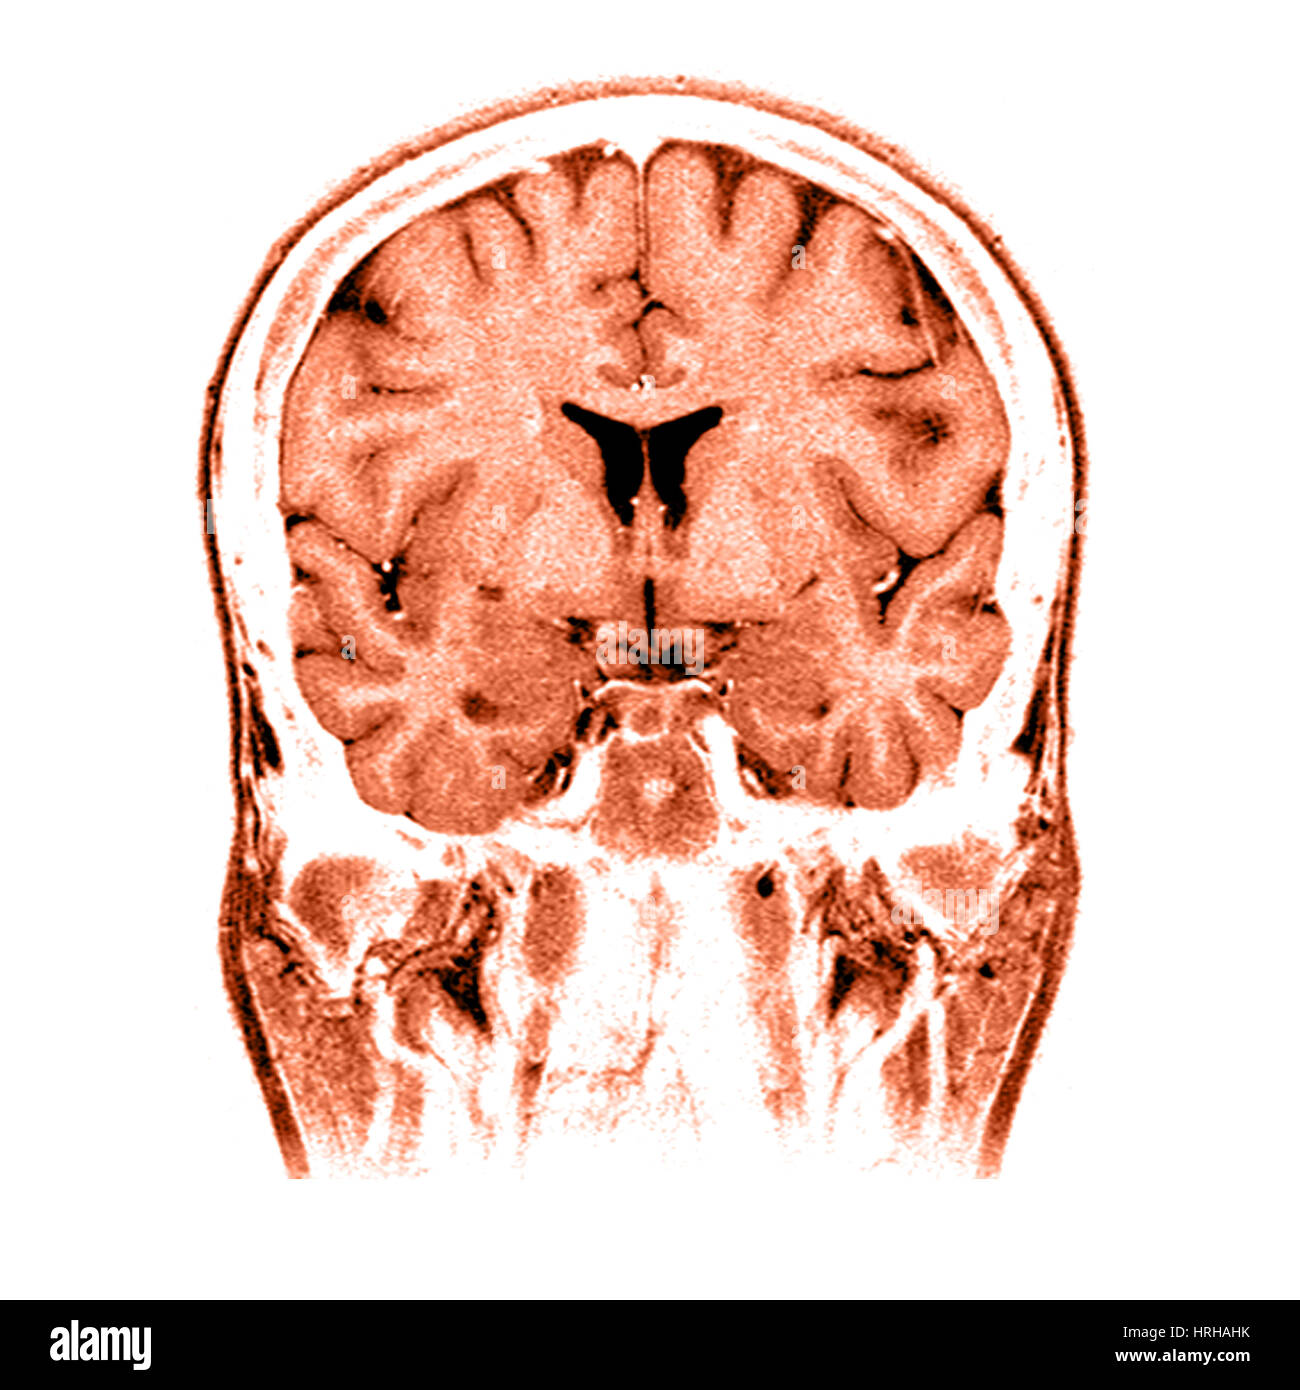 Atlas of Brain Function 9781588905253 Medicine amp Health